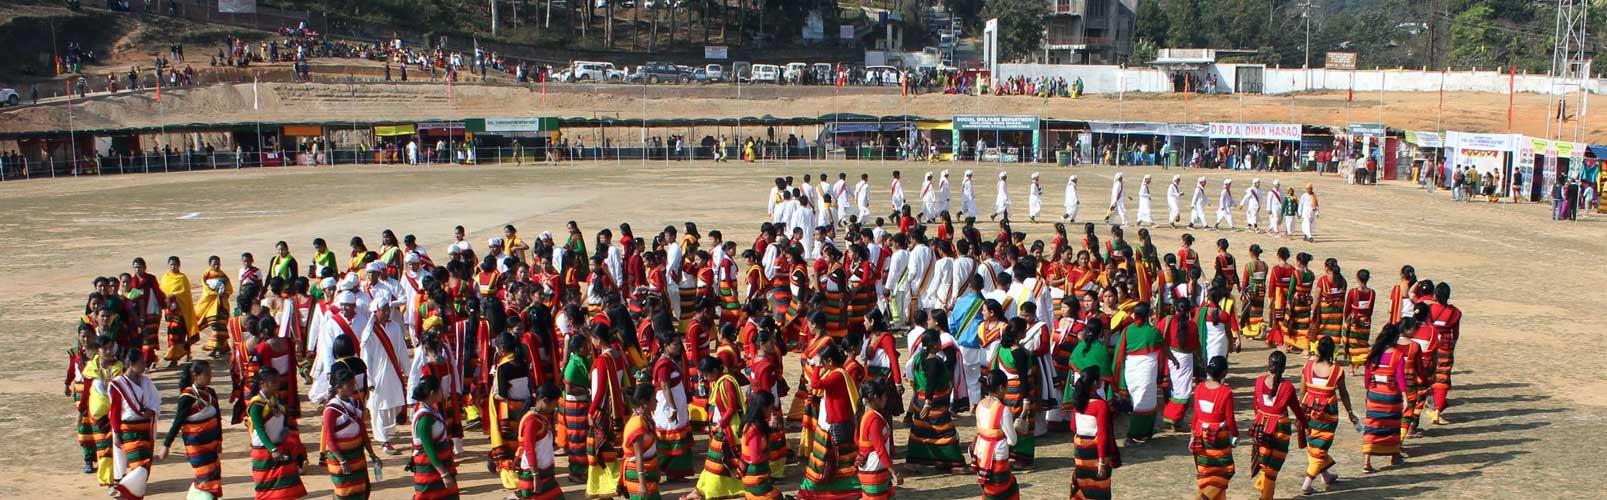 Culture.Dance - Bashu.Festival.Dima Hasao